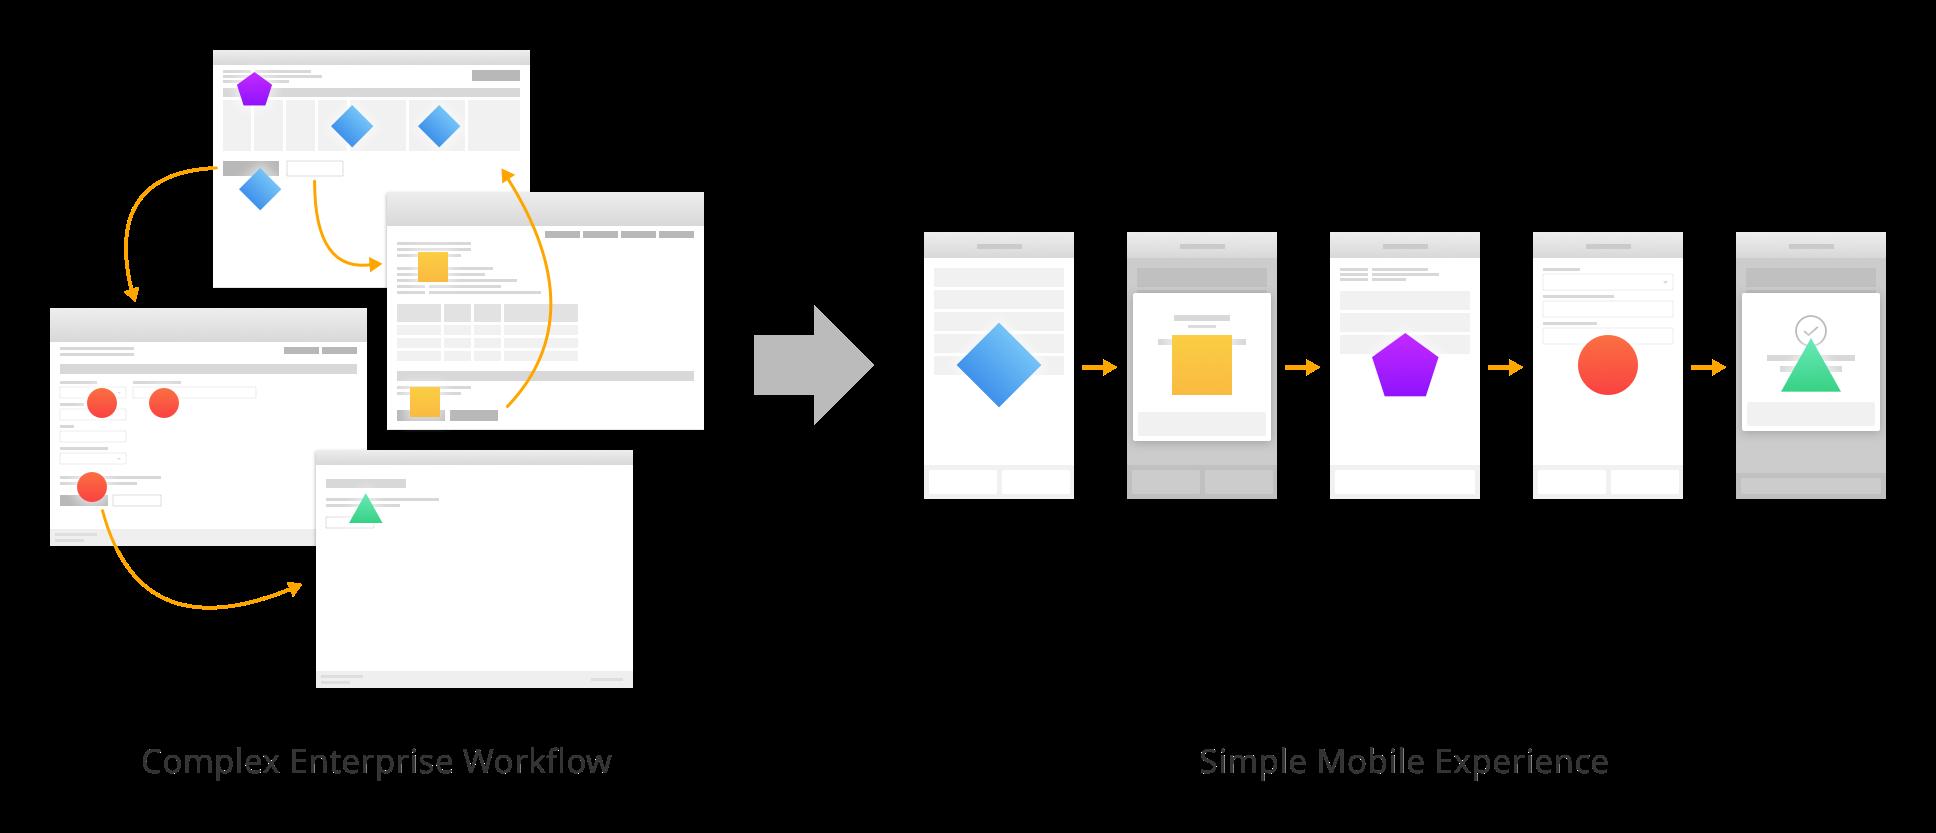 Capriza's technology turns complex enterprise workflows into simple mobile experiences.